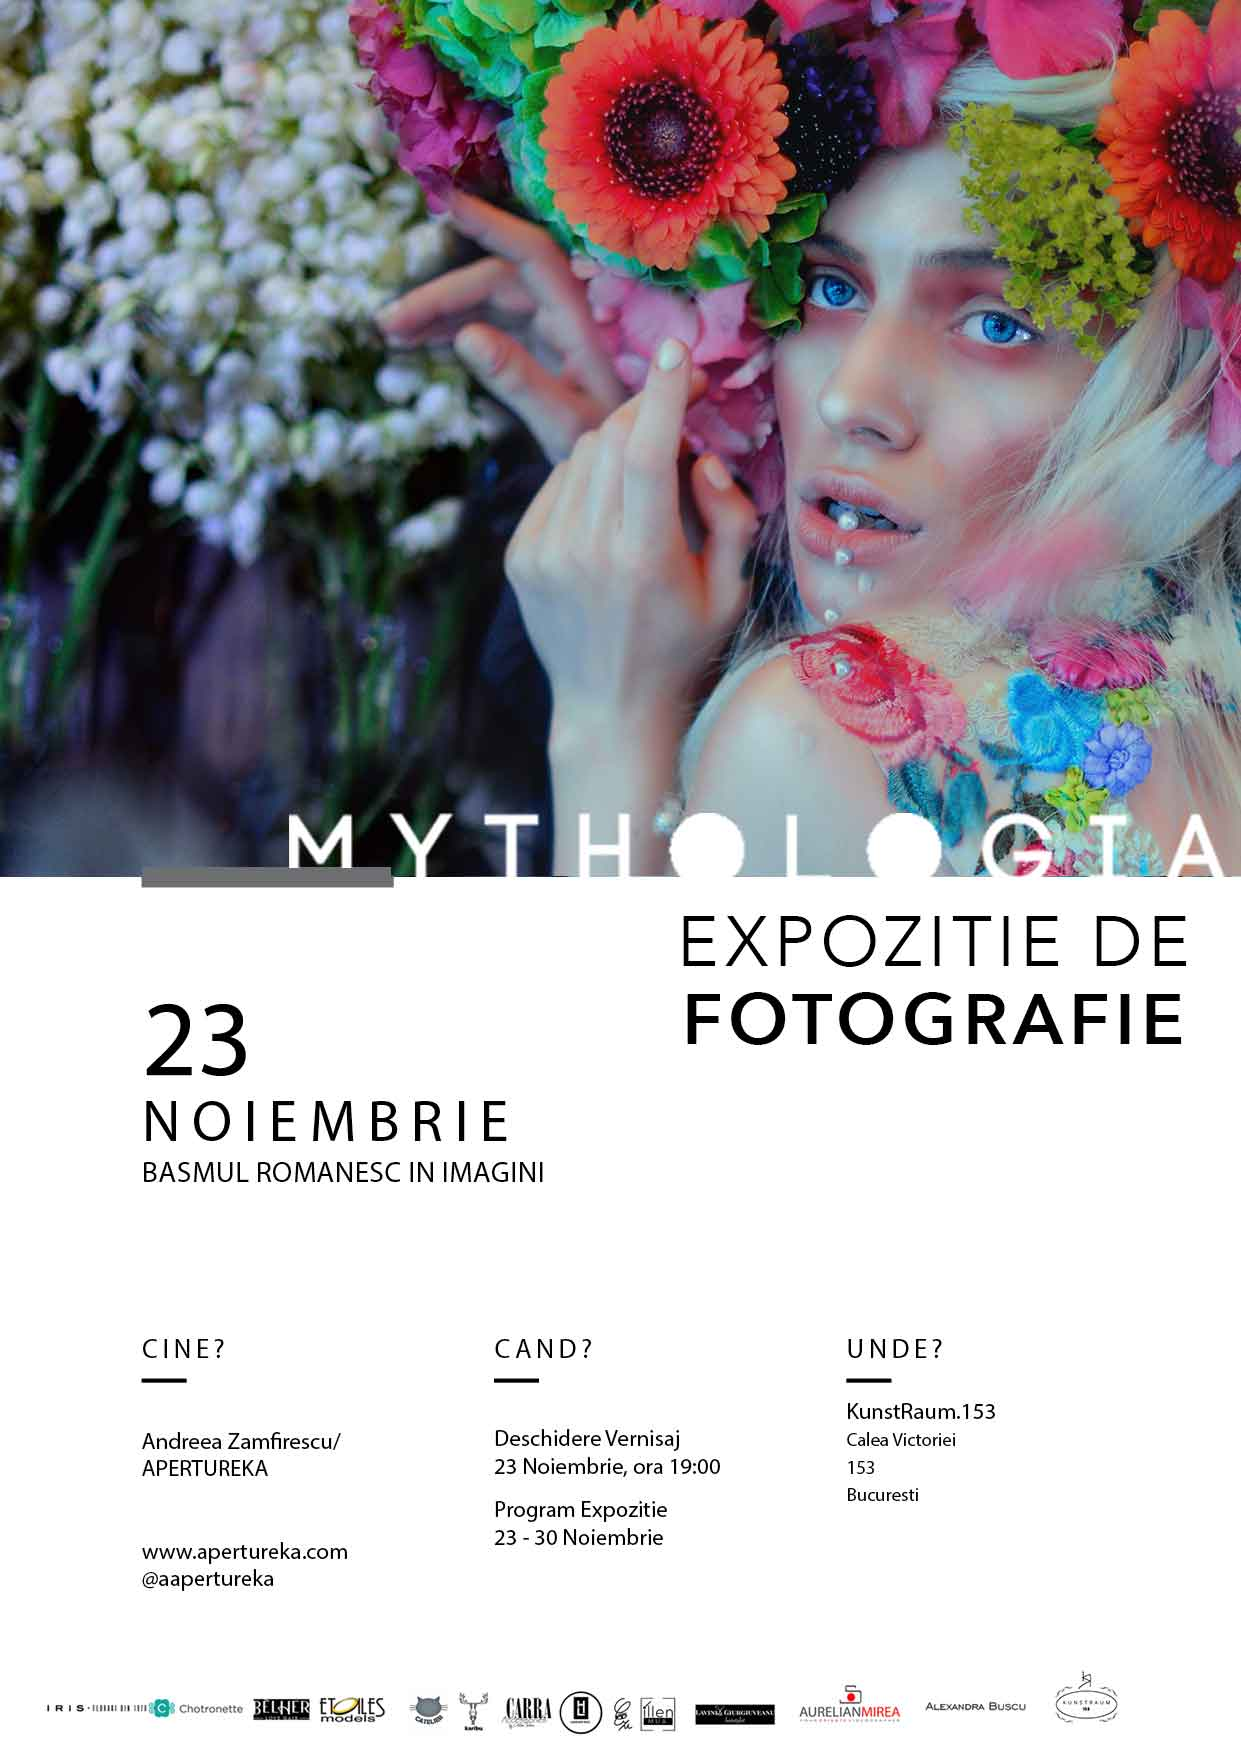 MYTHOLOGIA | Basmul Românesc În Imagini